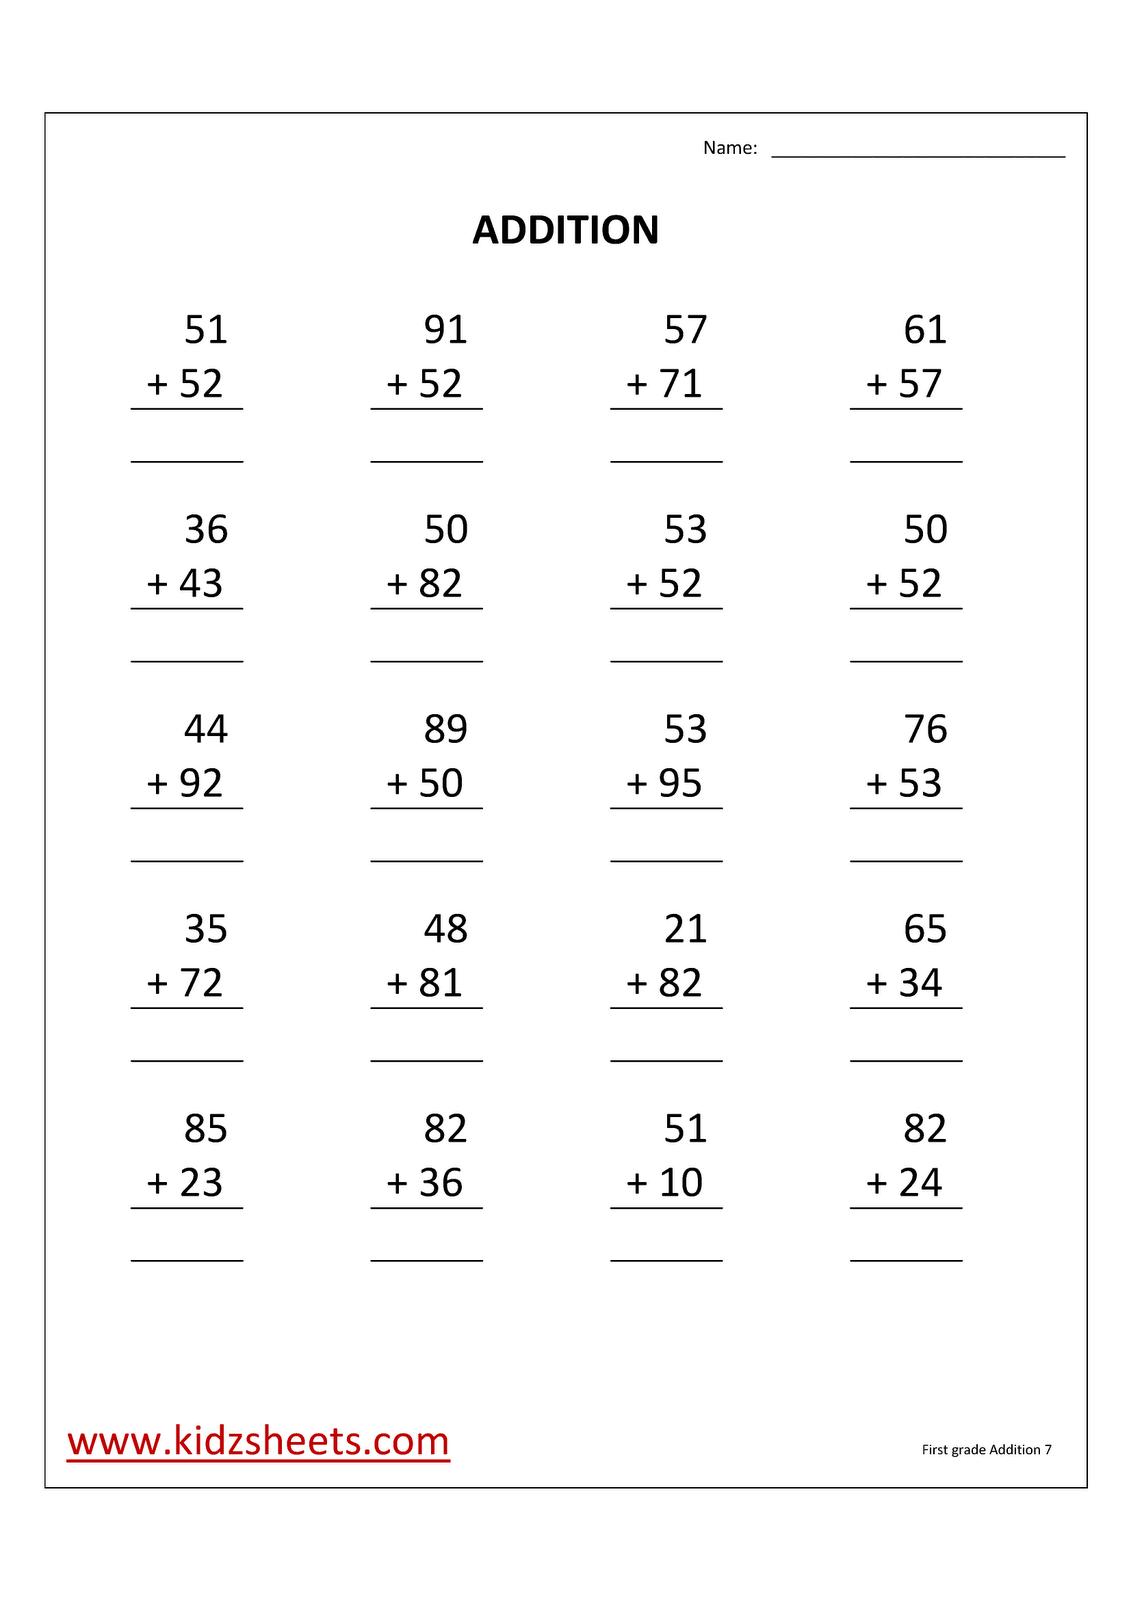 Kidz Worksheets First Grade Addition Worksheet